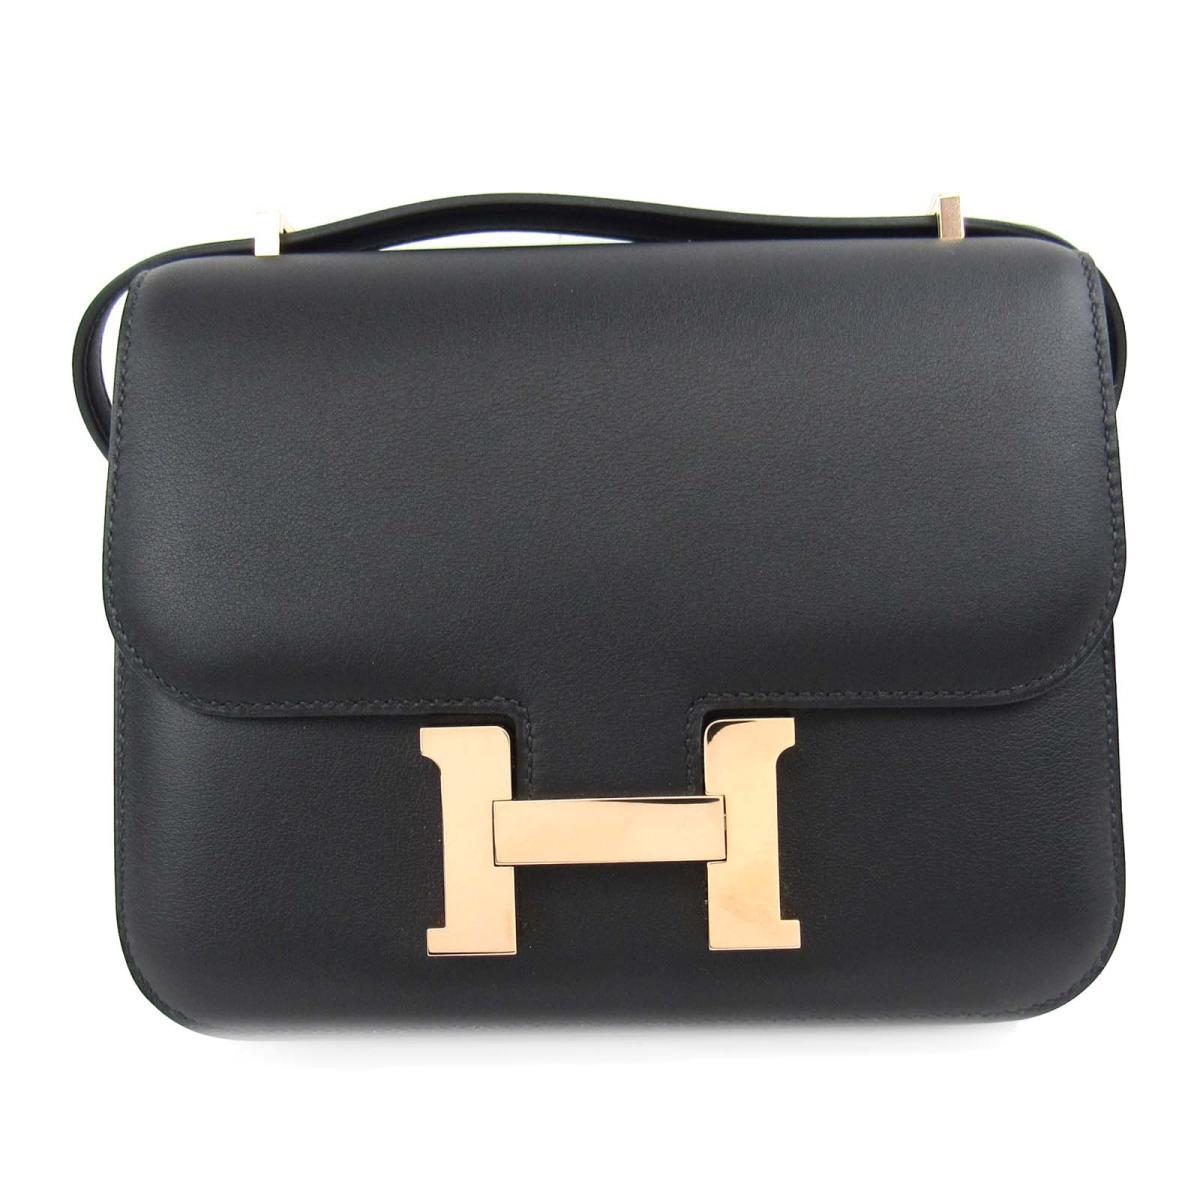 dfc685230ee8 Authentic HERMES mini Constance Shoulder Bag swift leather Black rose gold